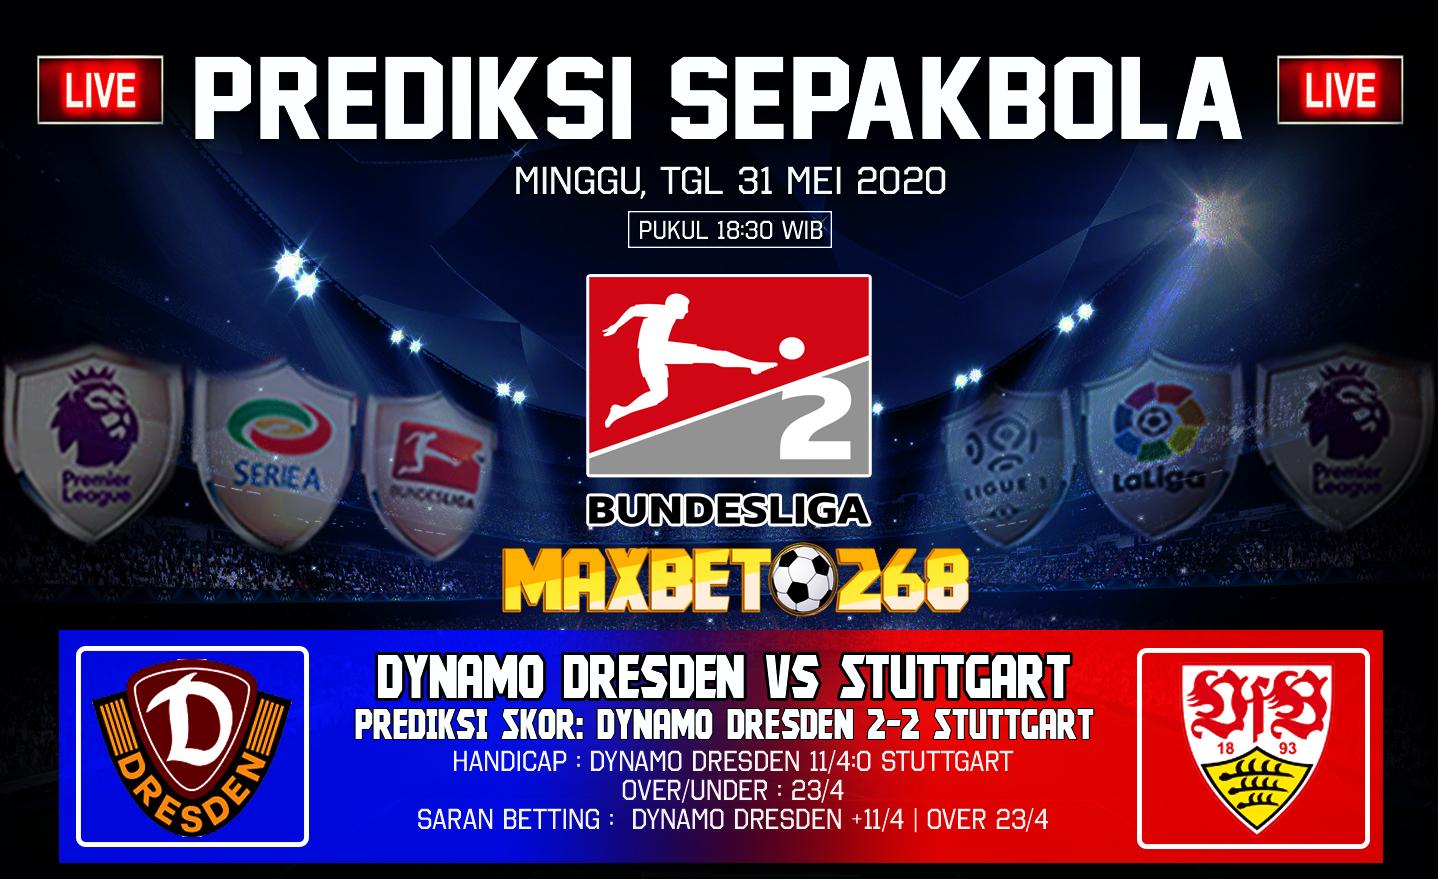 Prediksi Bola Dynamo Dresden Vs Stuttgart 31 Mei 2020 Pukul 18.30 WIB